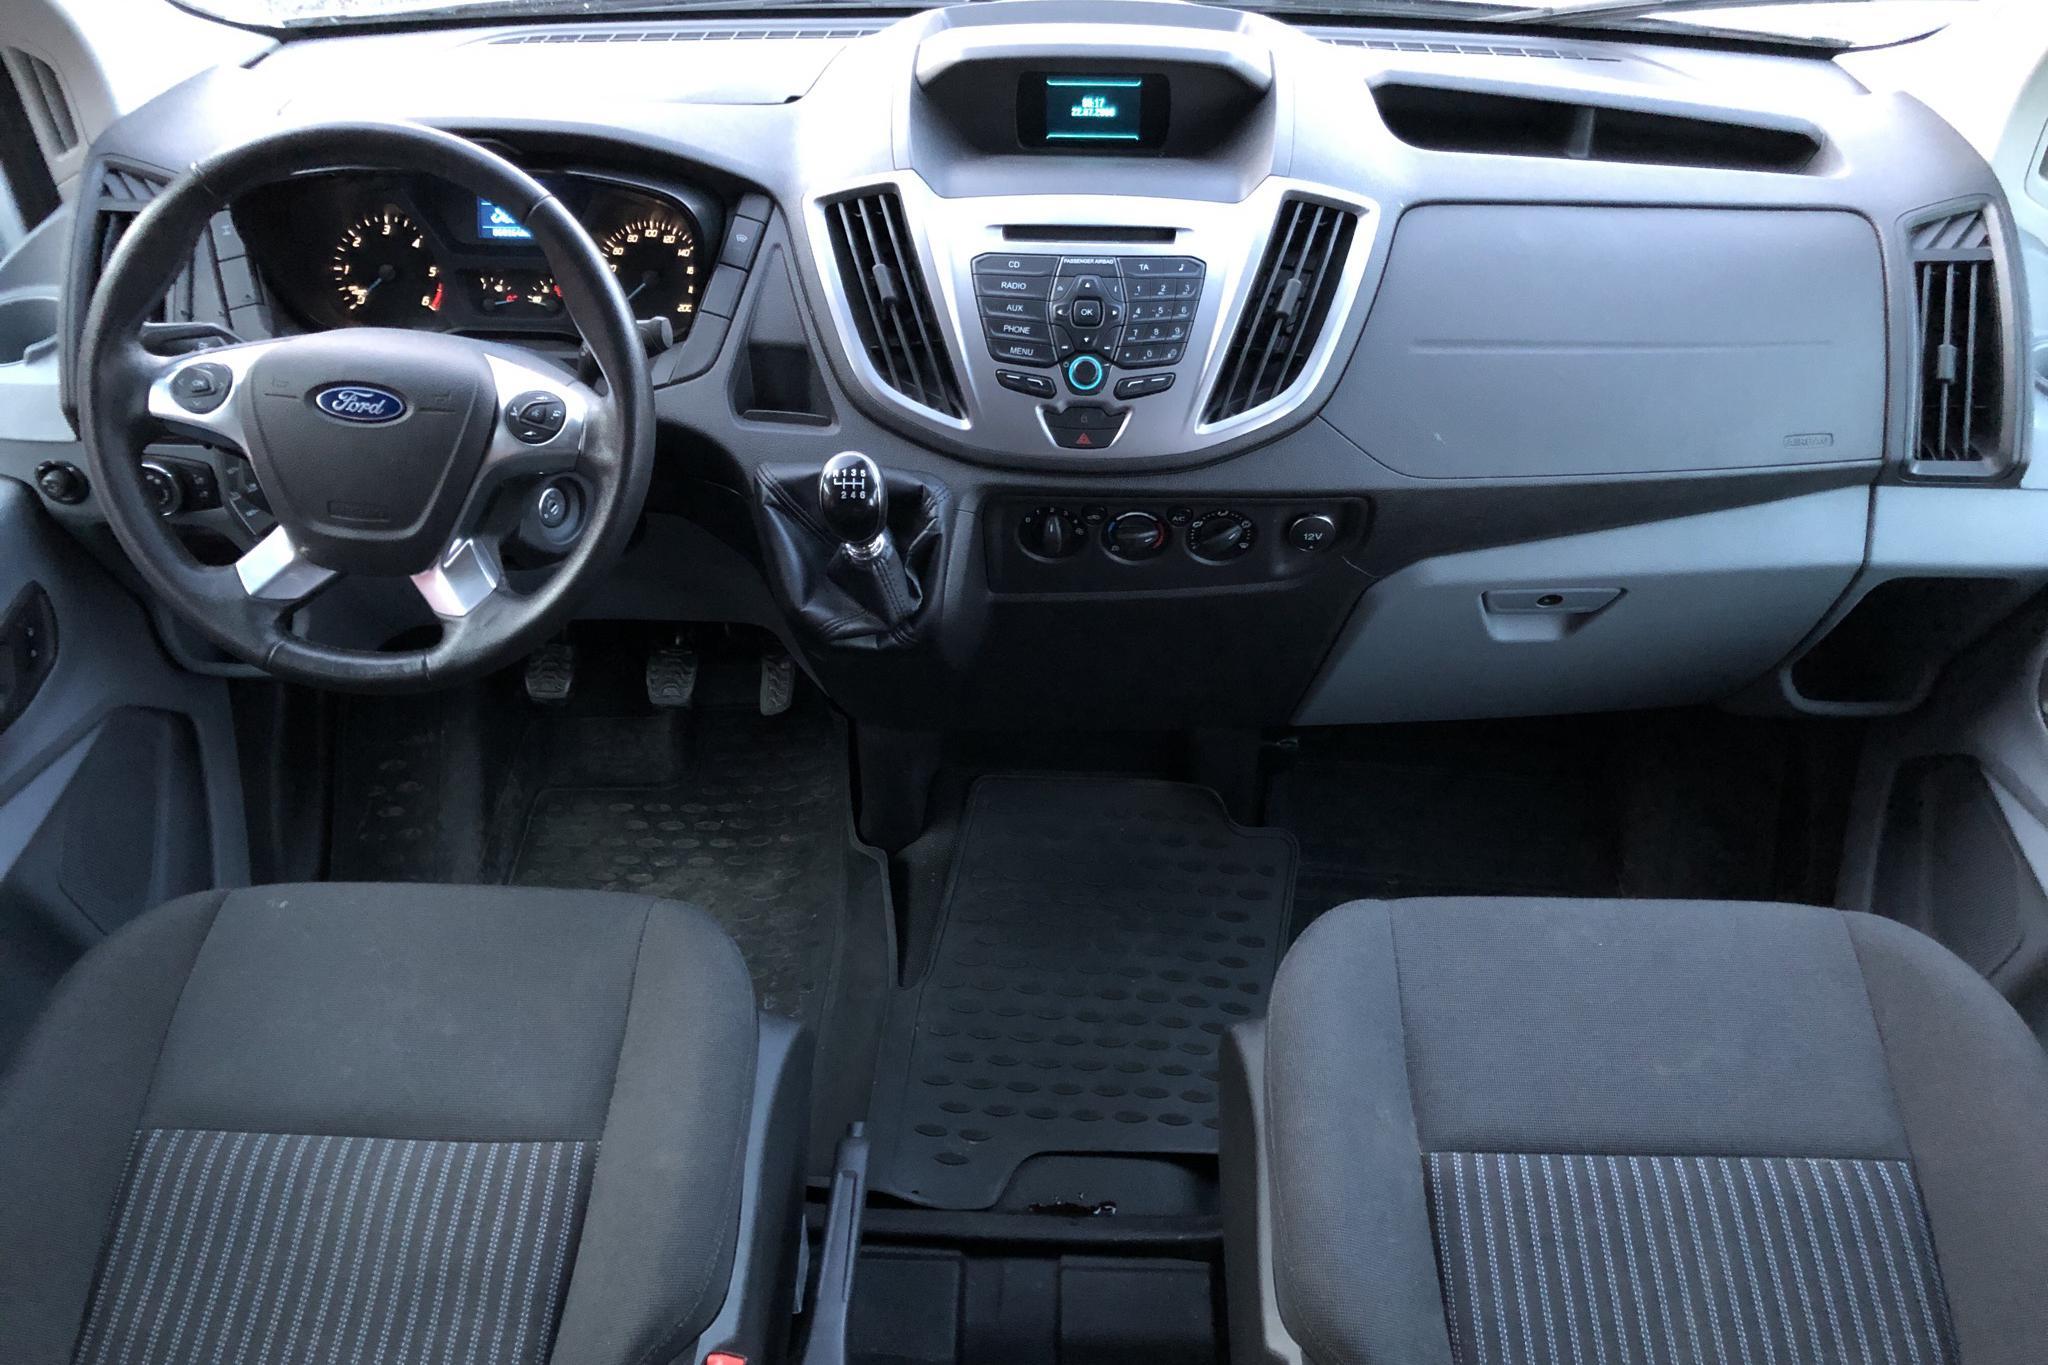 Ford Transit Chassi 350 2.2 TDCi AWD (125hk) - 6 815 mil - Manuell - vit - 2015